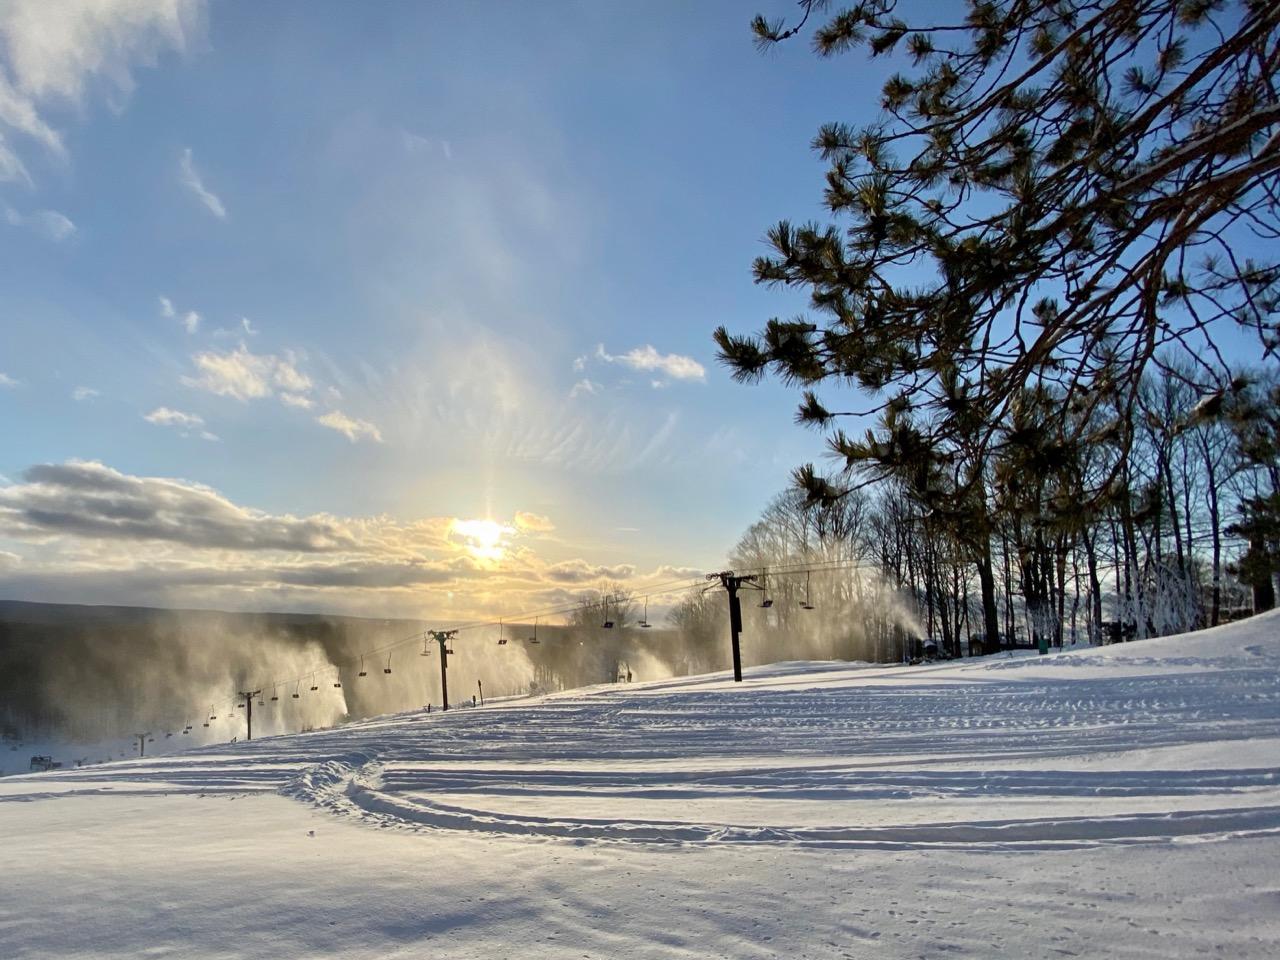 Snow Mountain in Michigan